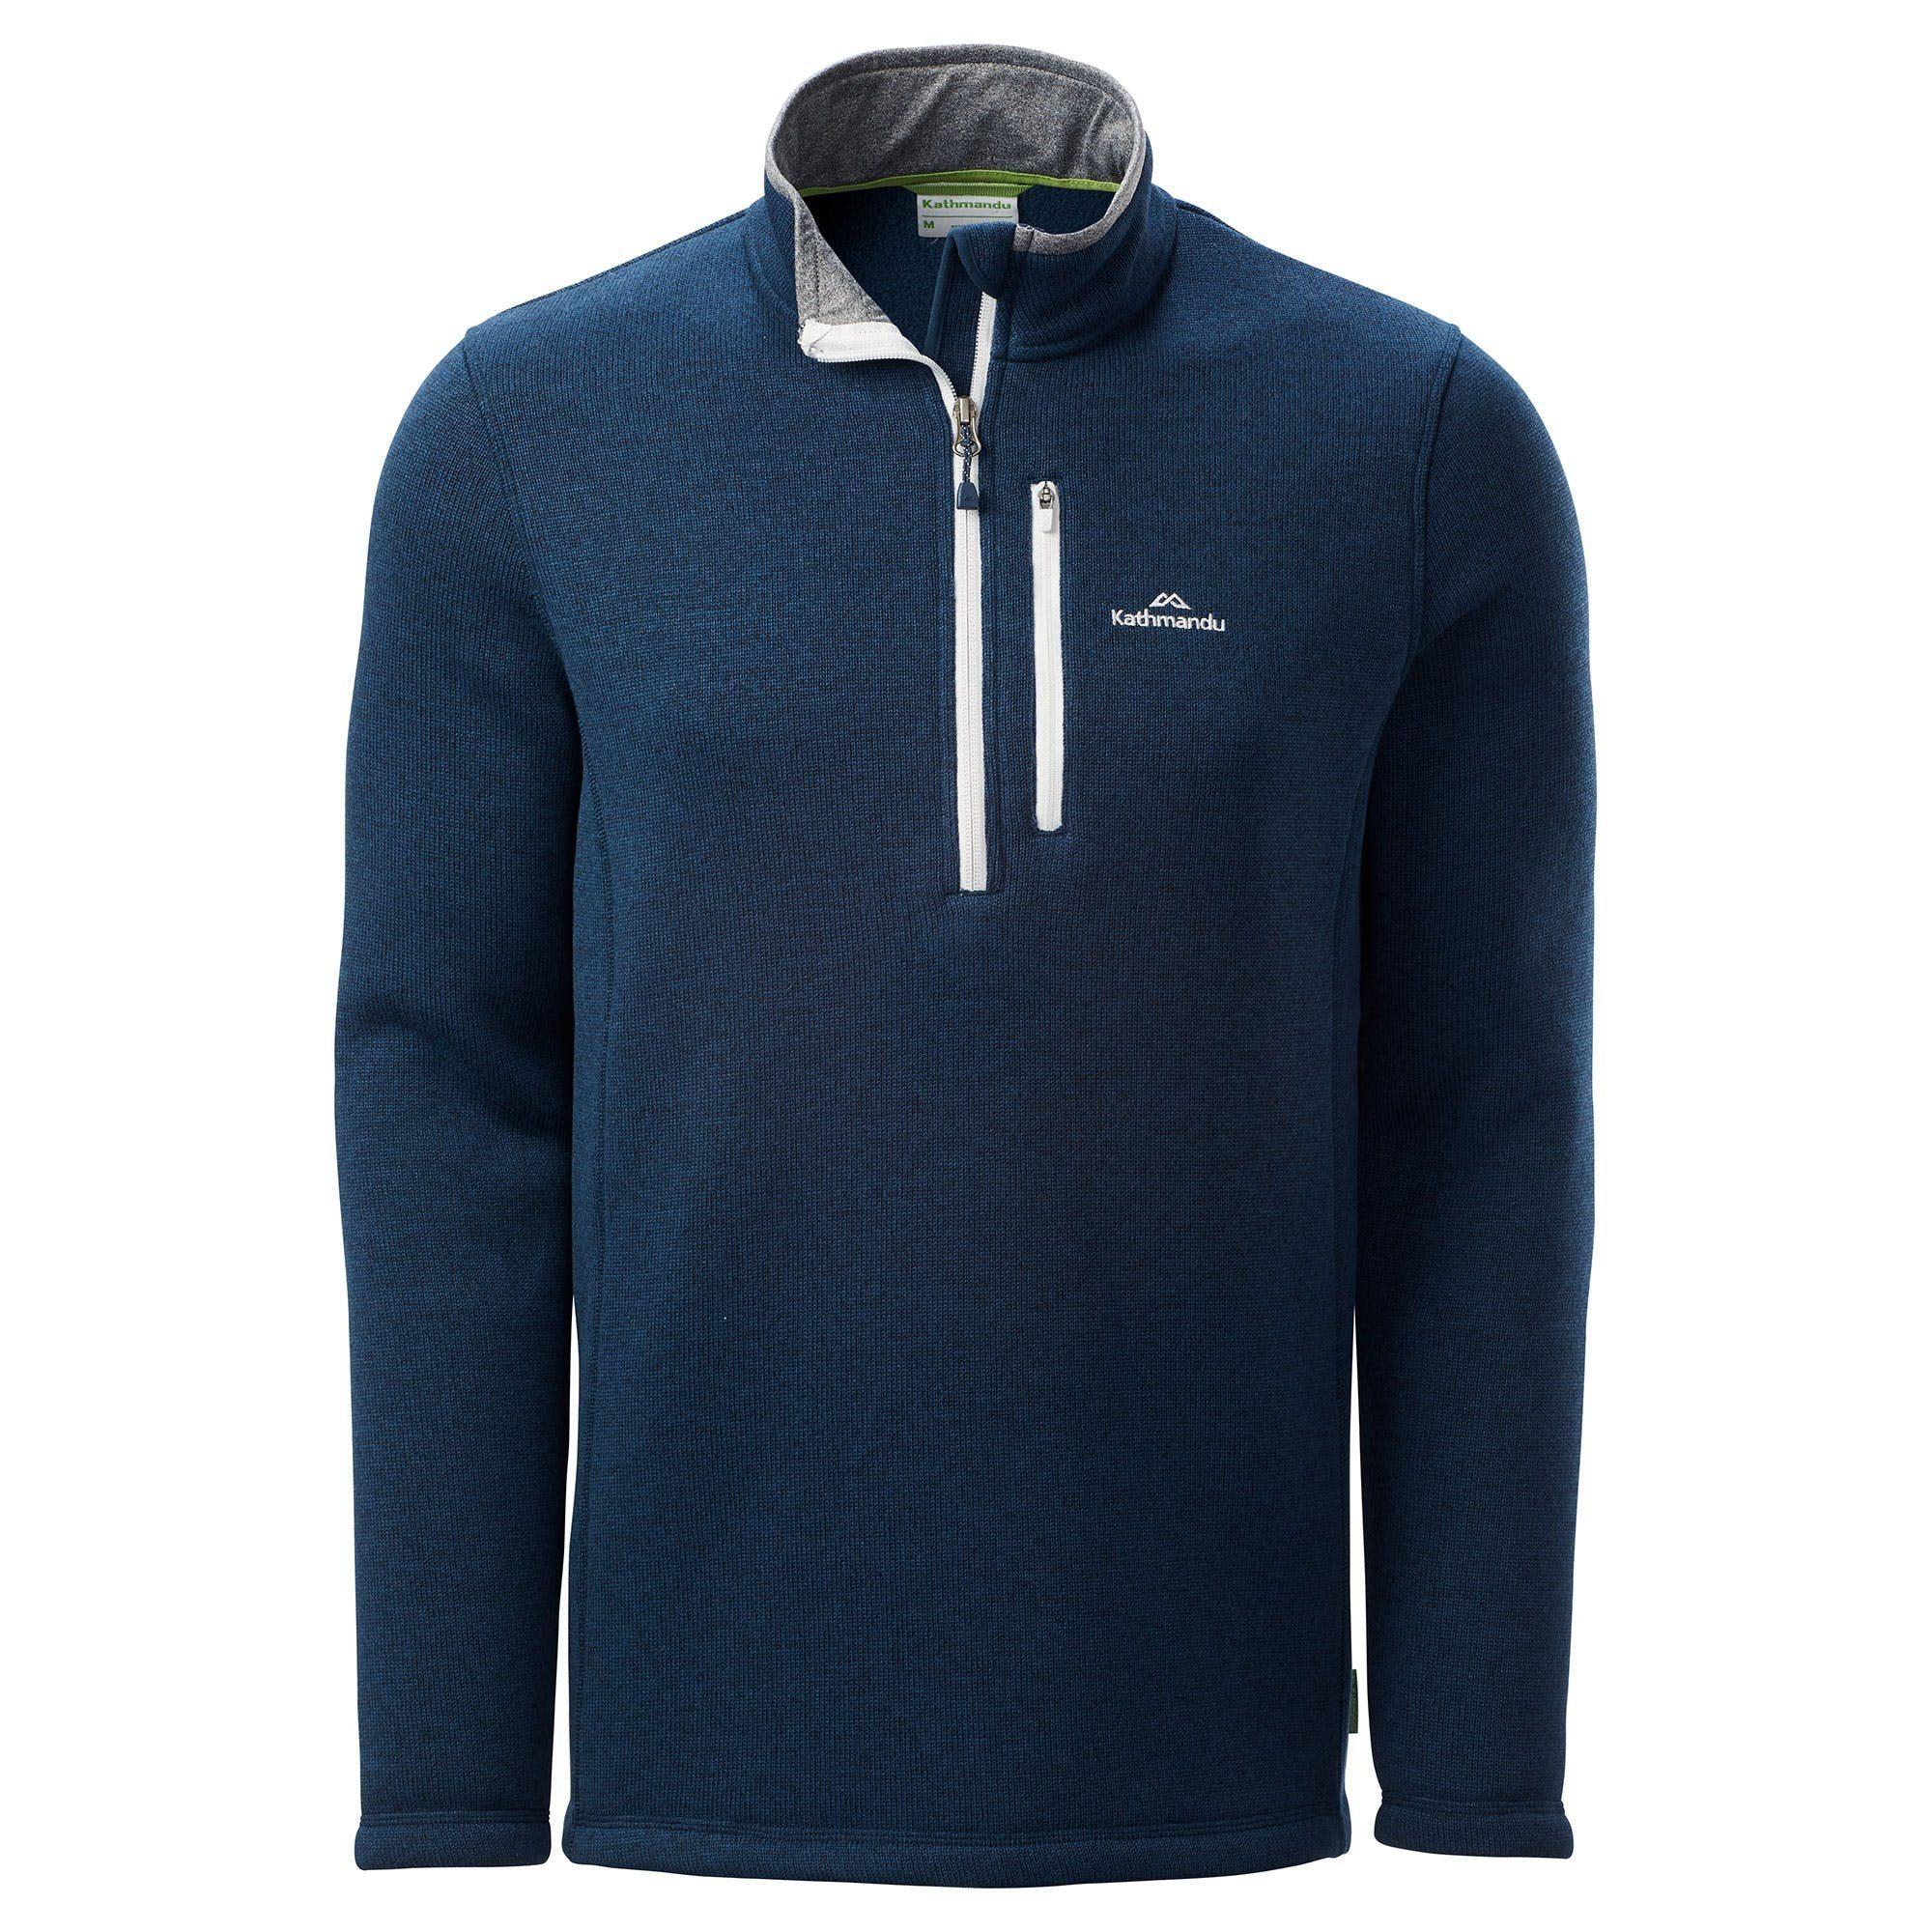 Kathmandu Pullover Aikman | Bekleidung > Pullover > Sonstige Pullover | Kathmandu